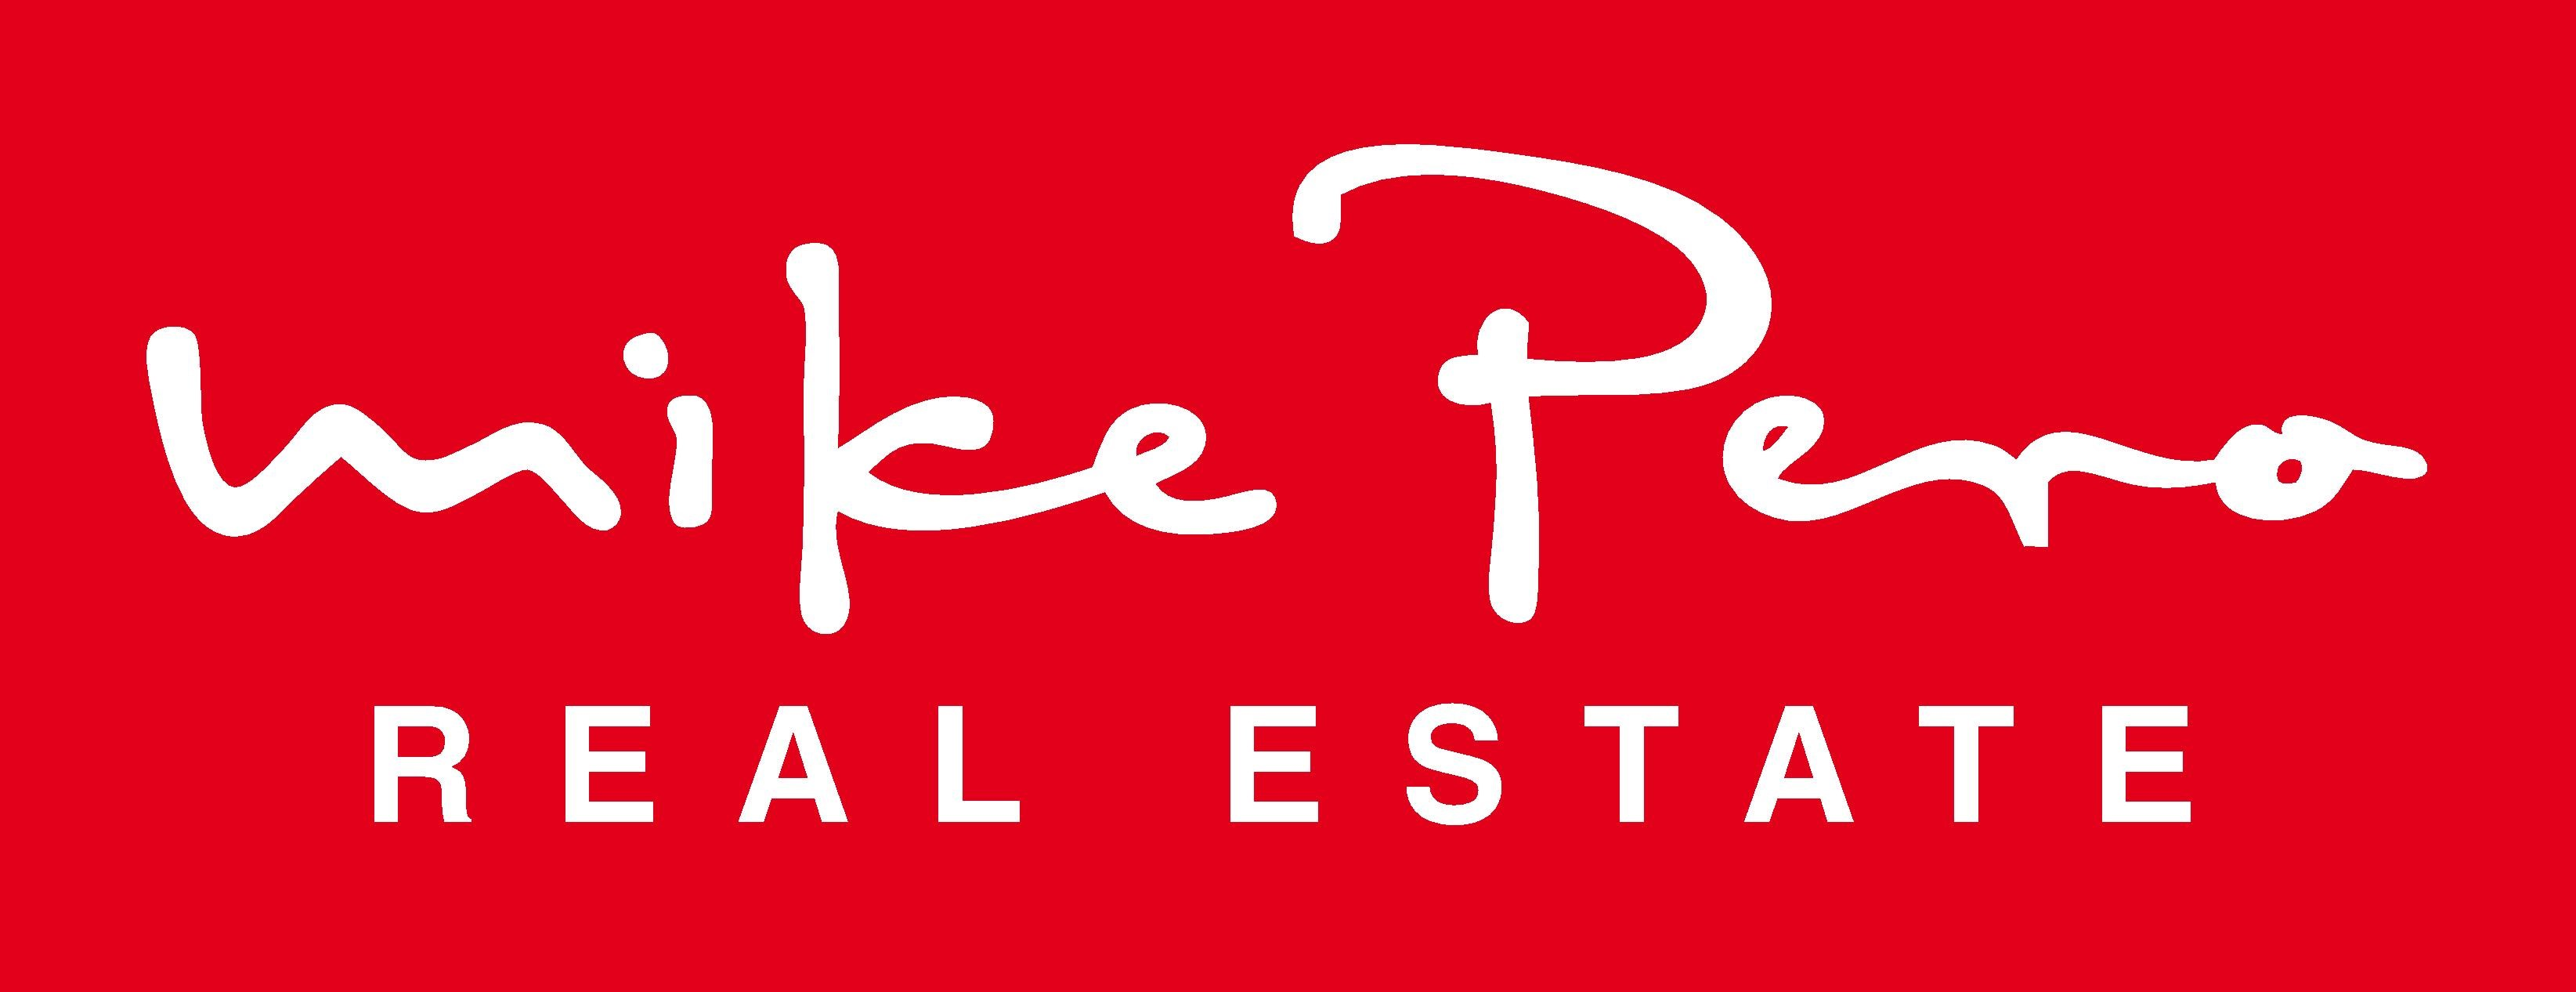 Mike Pero Real Estate